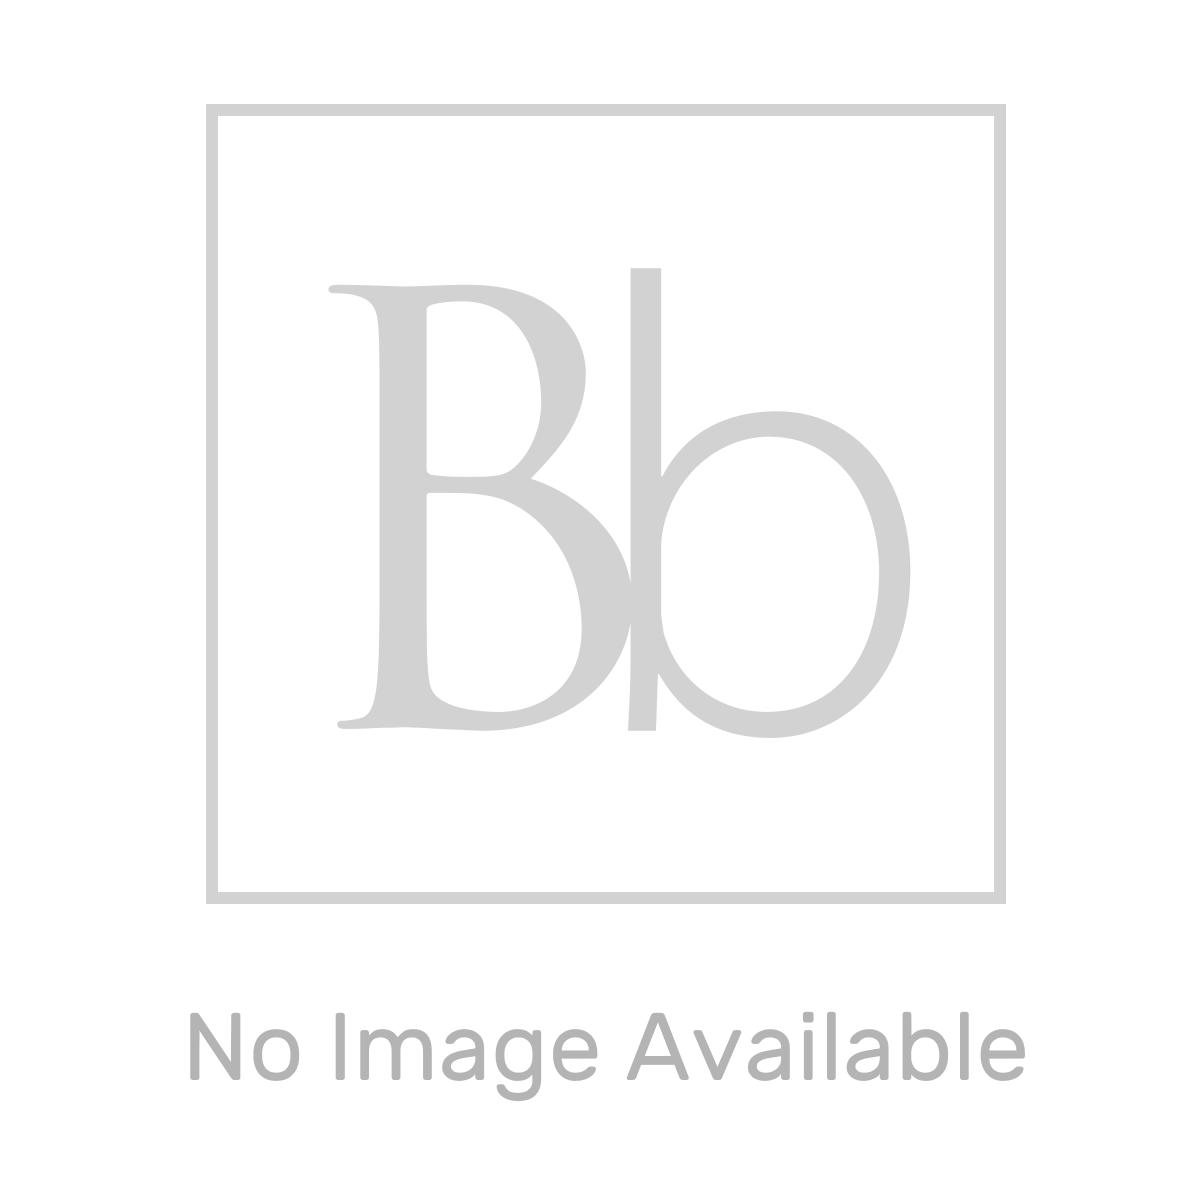 RAK Surface Cool Grey Rustic Tile 600 x 600mm